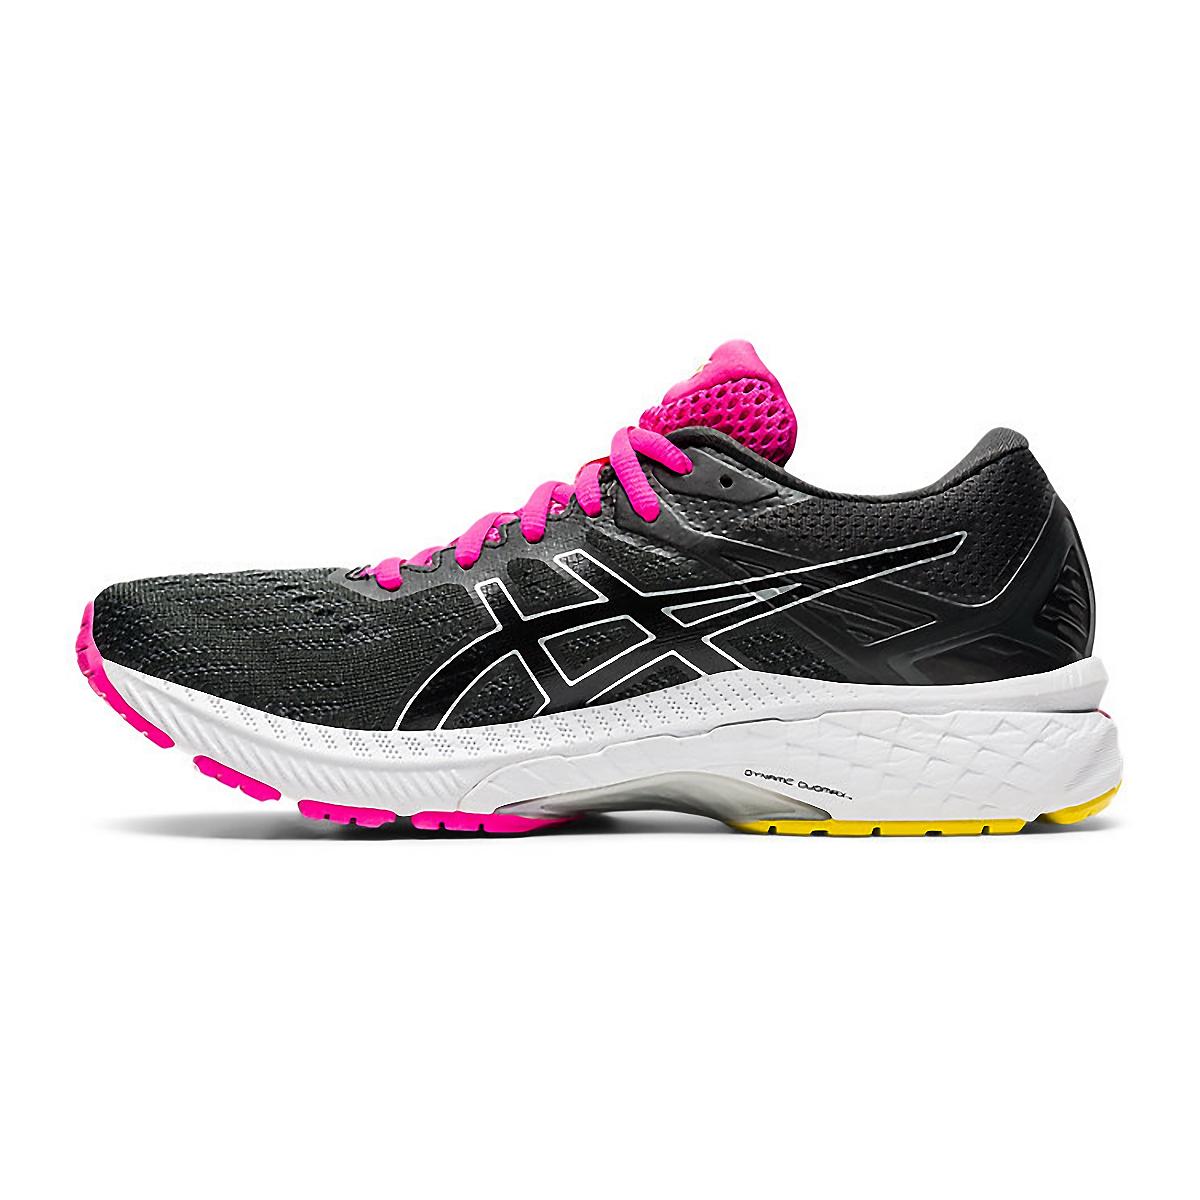 Women's Asics GT-2000 9 Running Shoe - Color: Graphite Grey/Black - Size: 5 - Width: Regular, Graphite Grey/Black, large, image 2